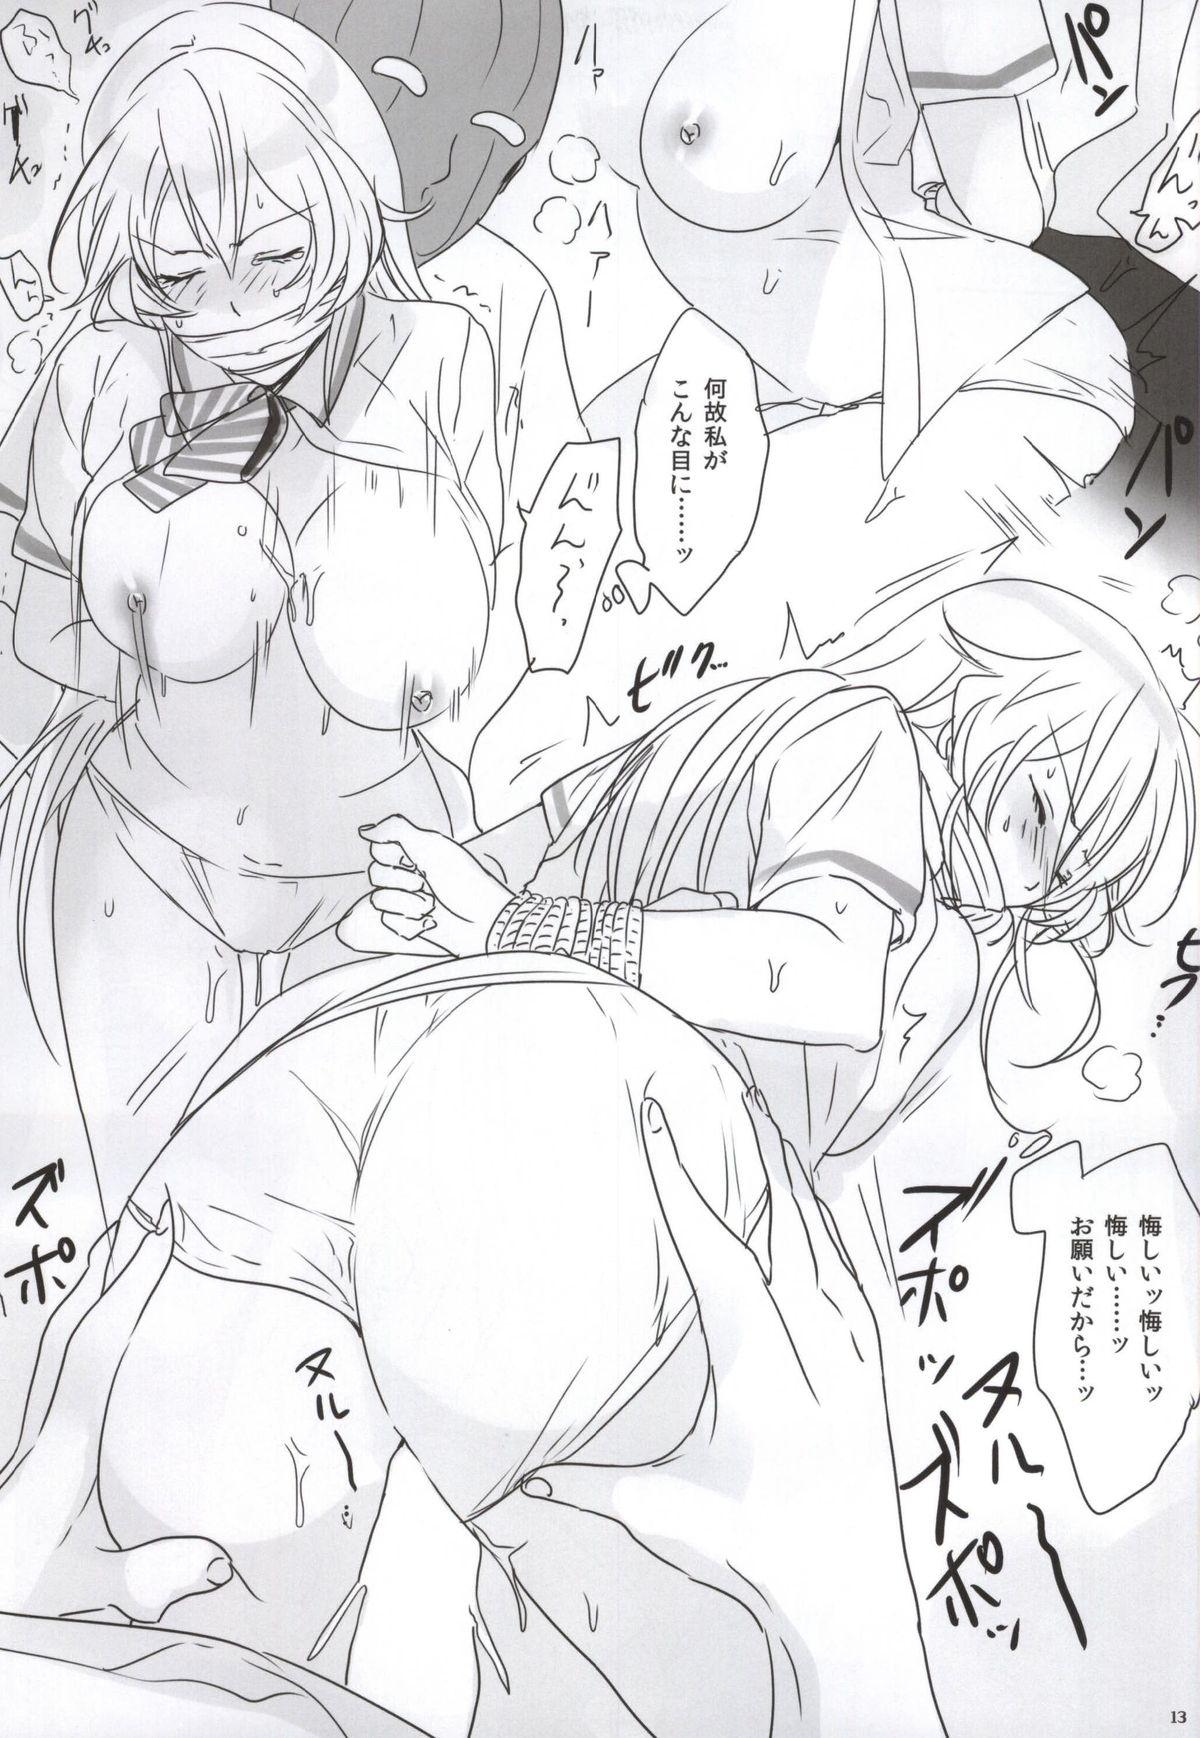 Erina-sama Tsukamaeta 11